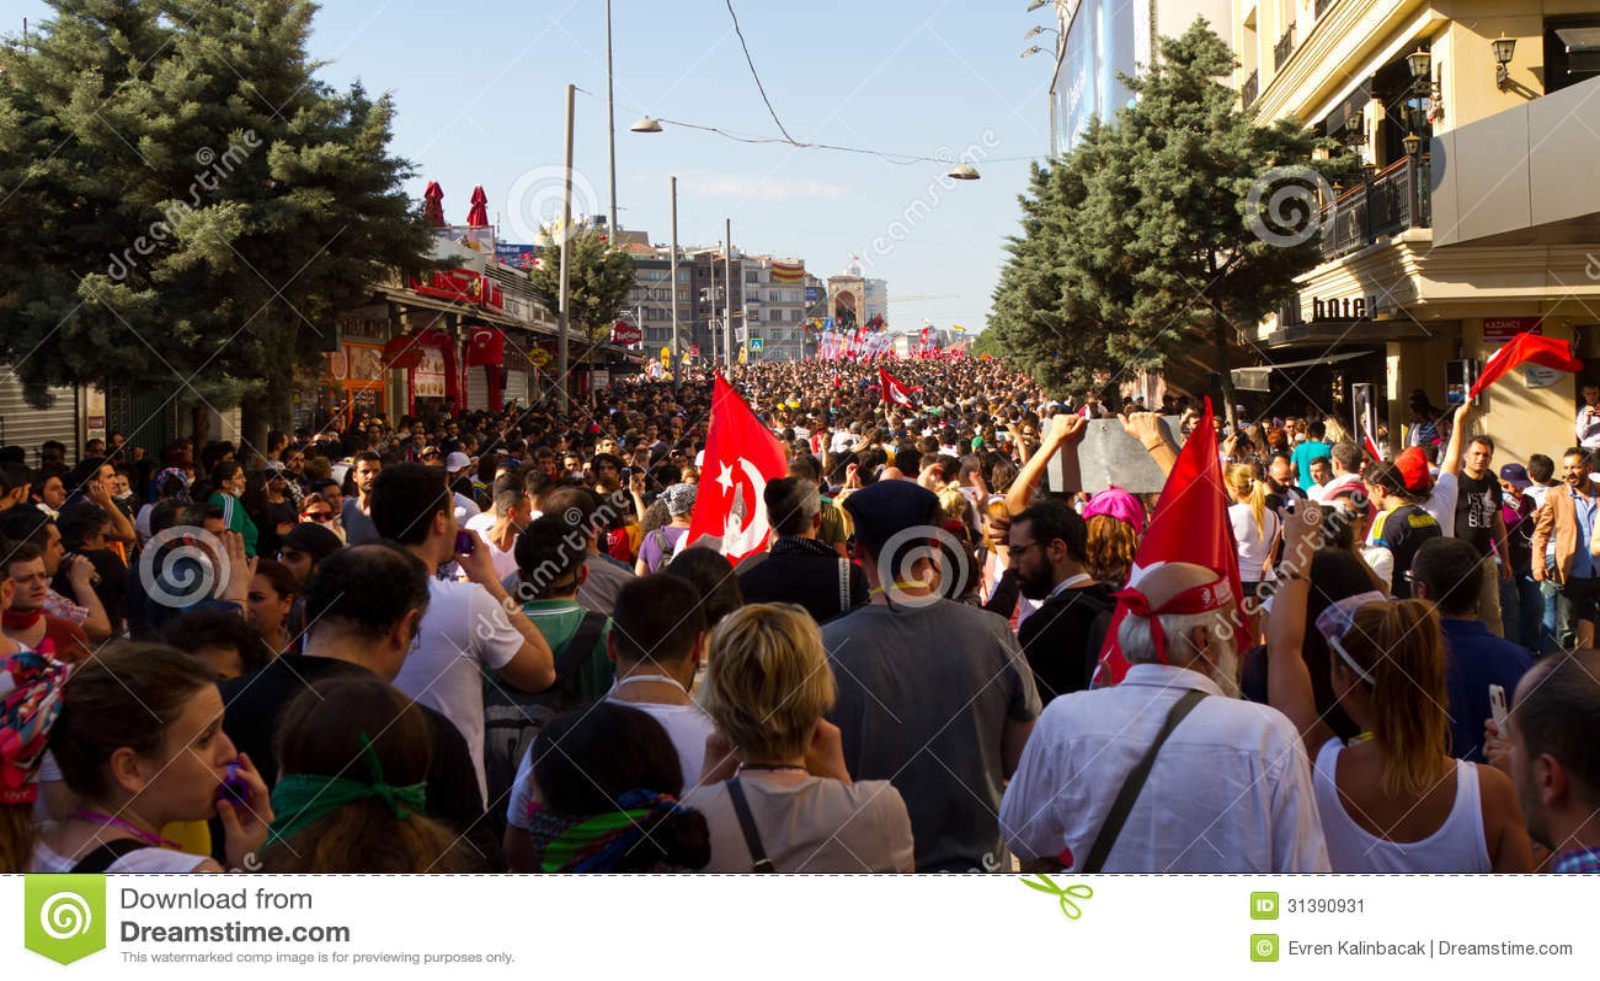 In concession, Erdogan halts Istanbul park plans, for now